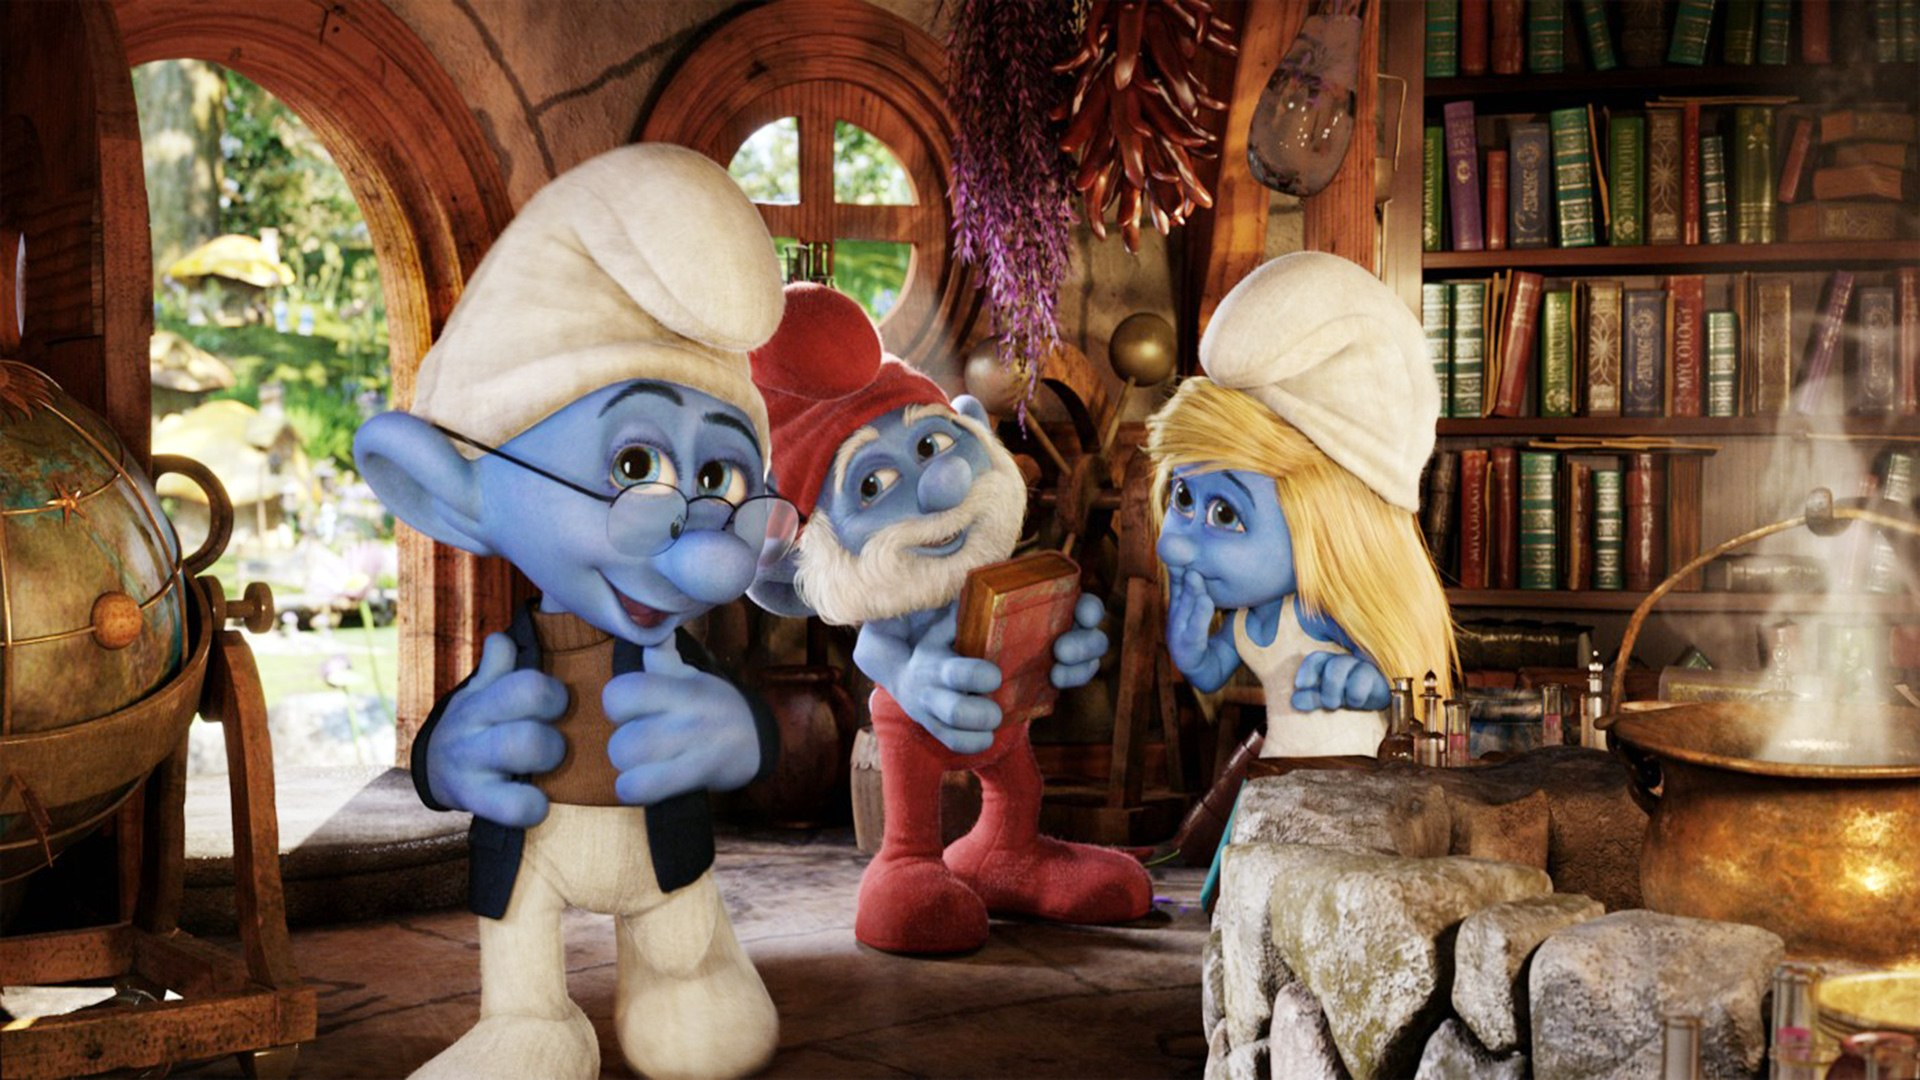 The Smurfs 2 2013 Full Movie Video Dailymotion